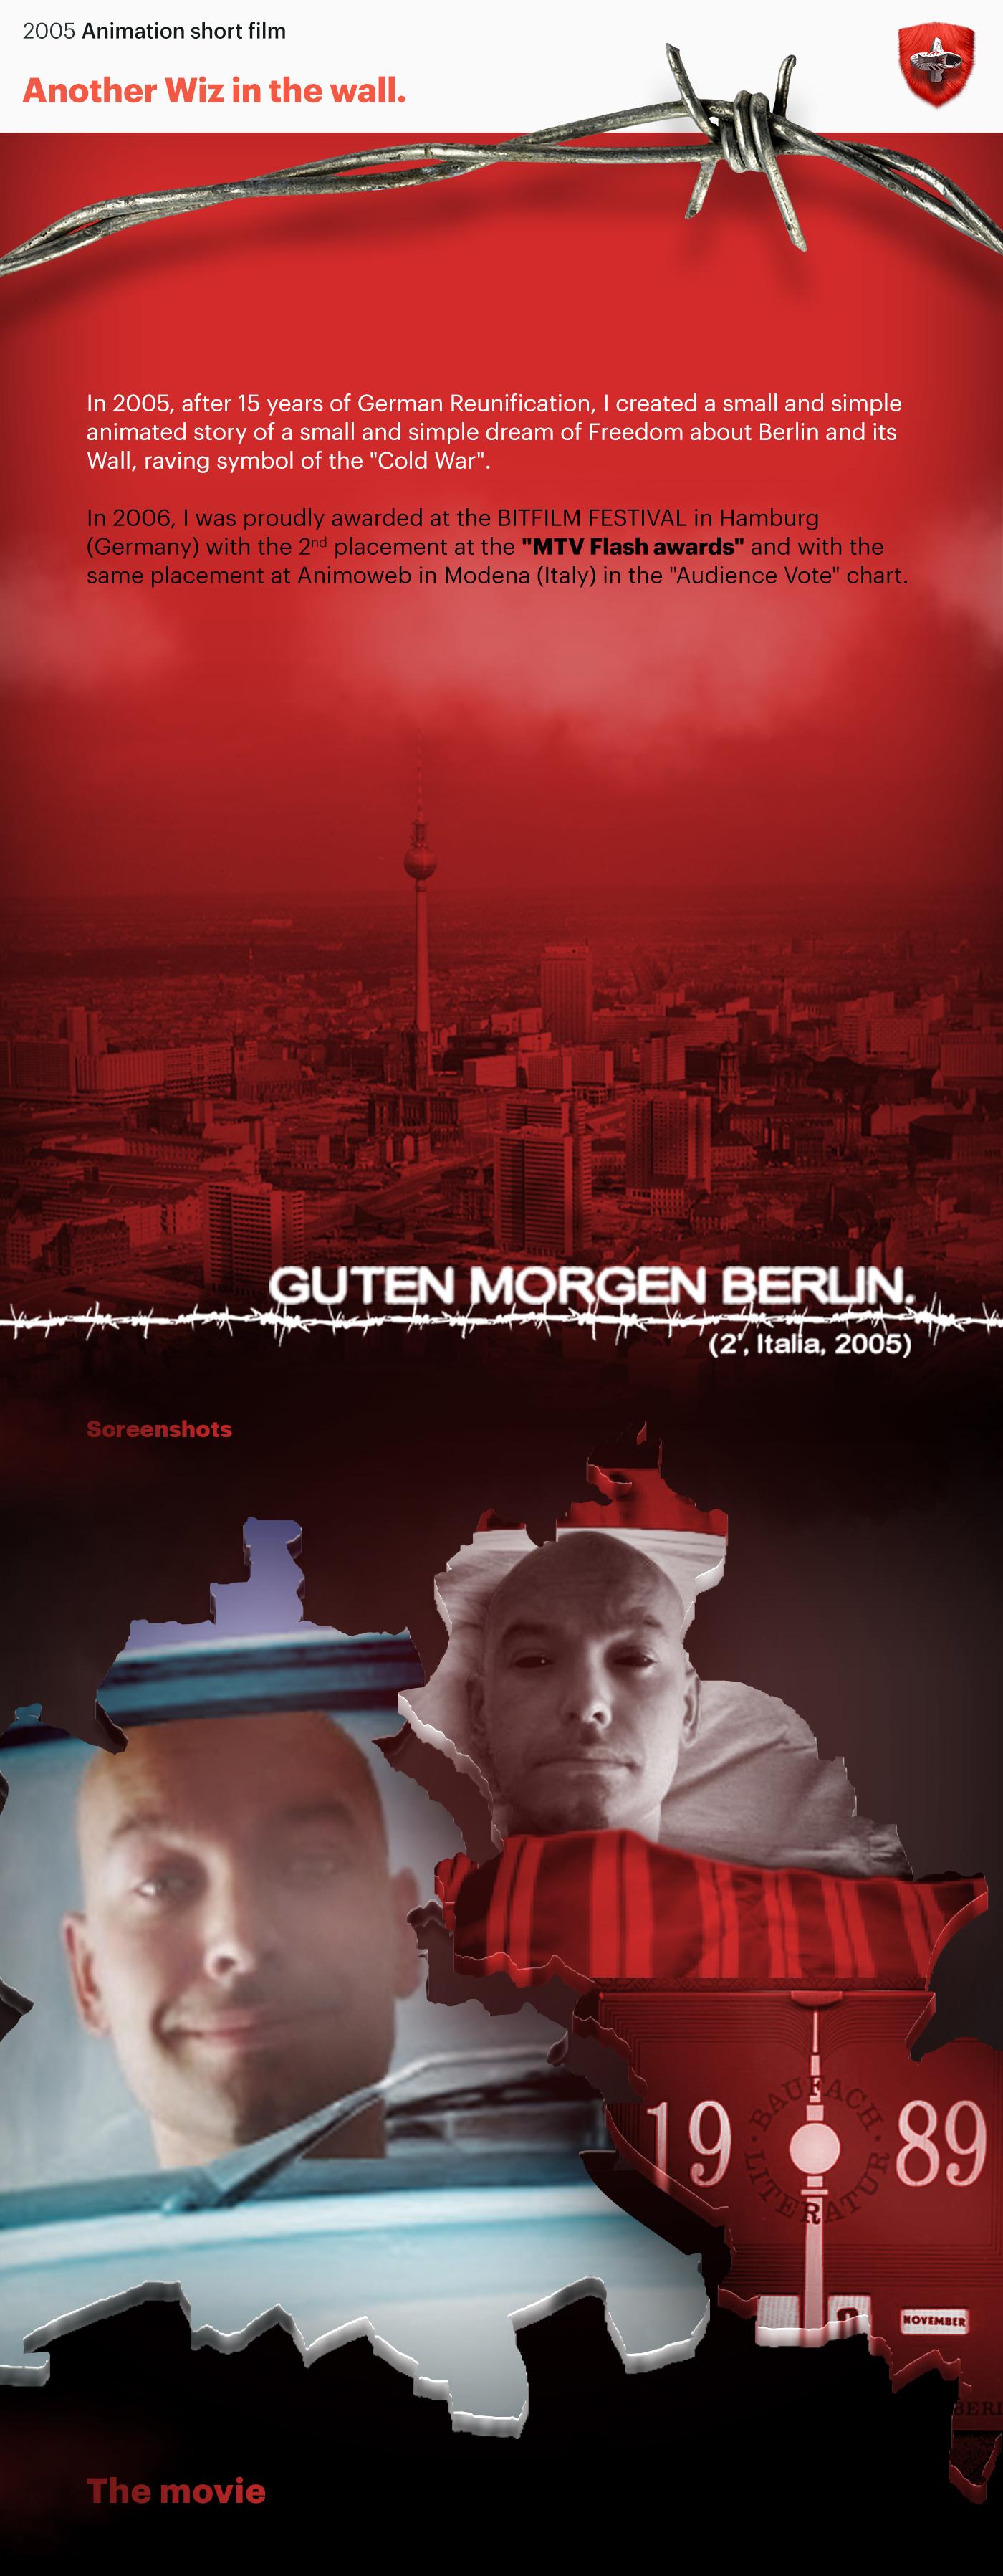 berlin,wall,shortfilm,2D Animation,motion graphic,Photo Manipulation ,Mtv,Bitfilm Festival